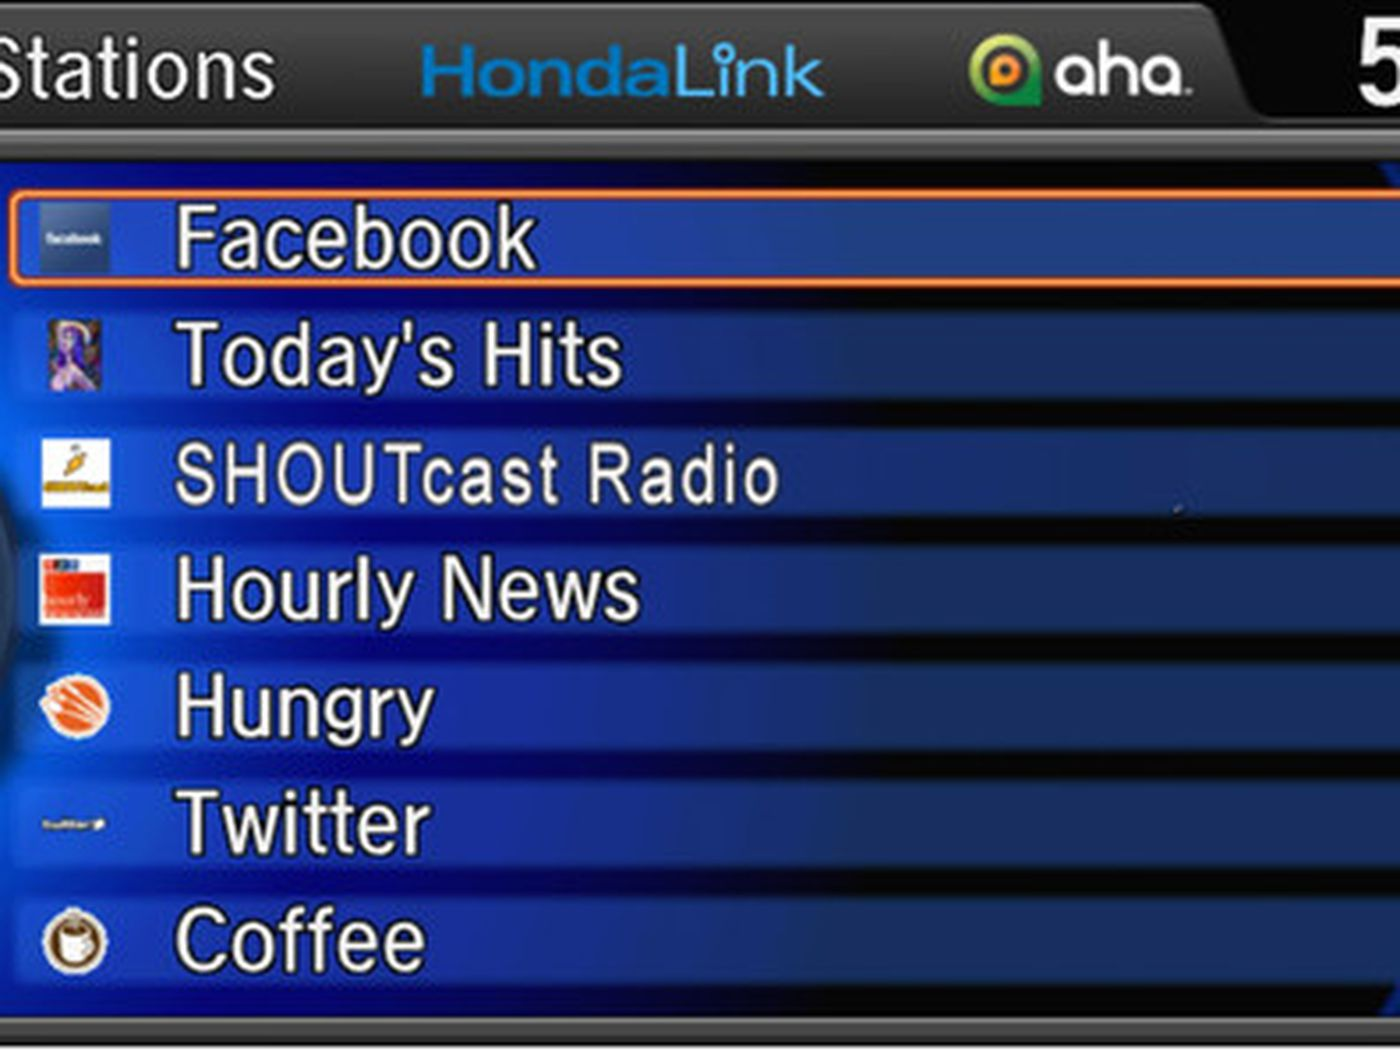 HondaLink brings Aha Radio powered audio content to Honda vehicles 1400x1050